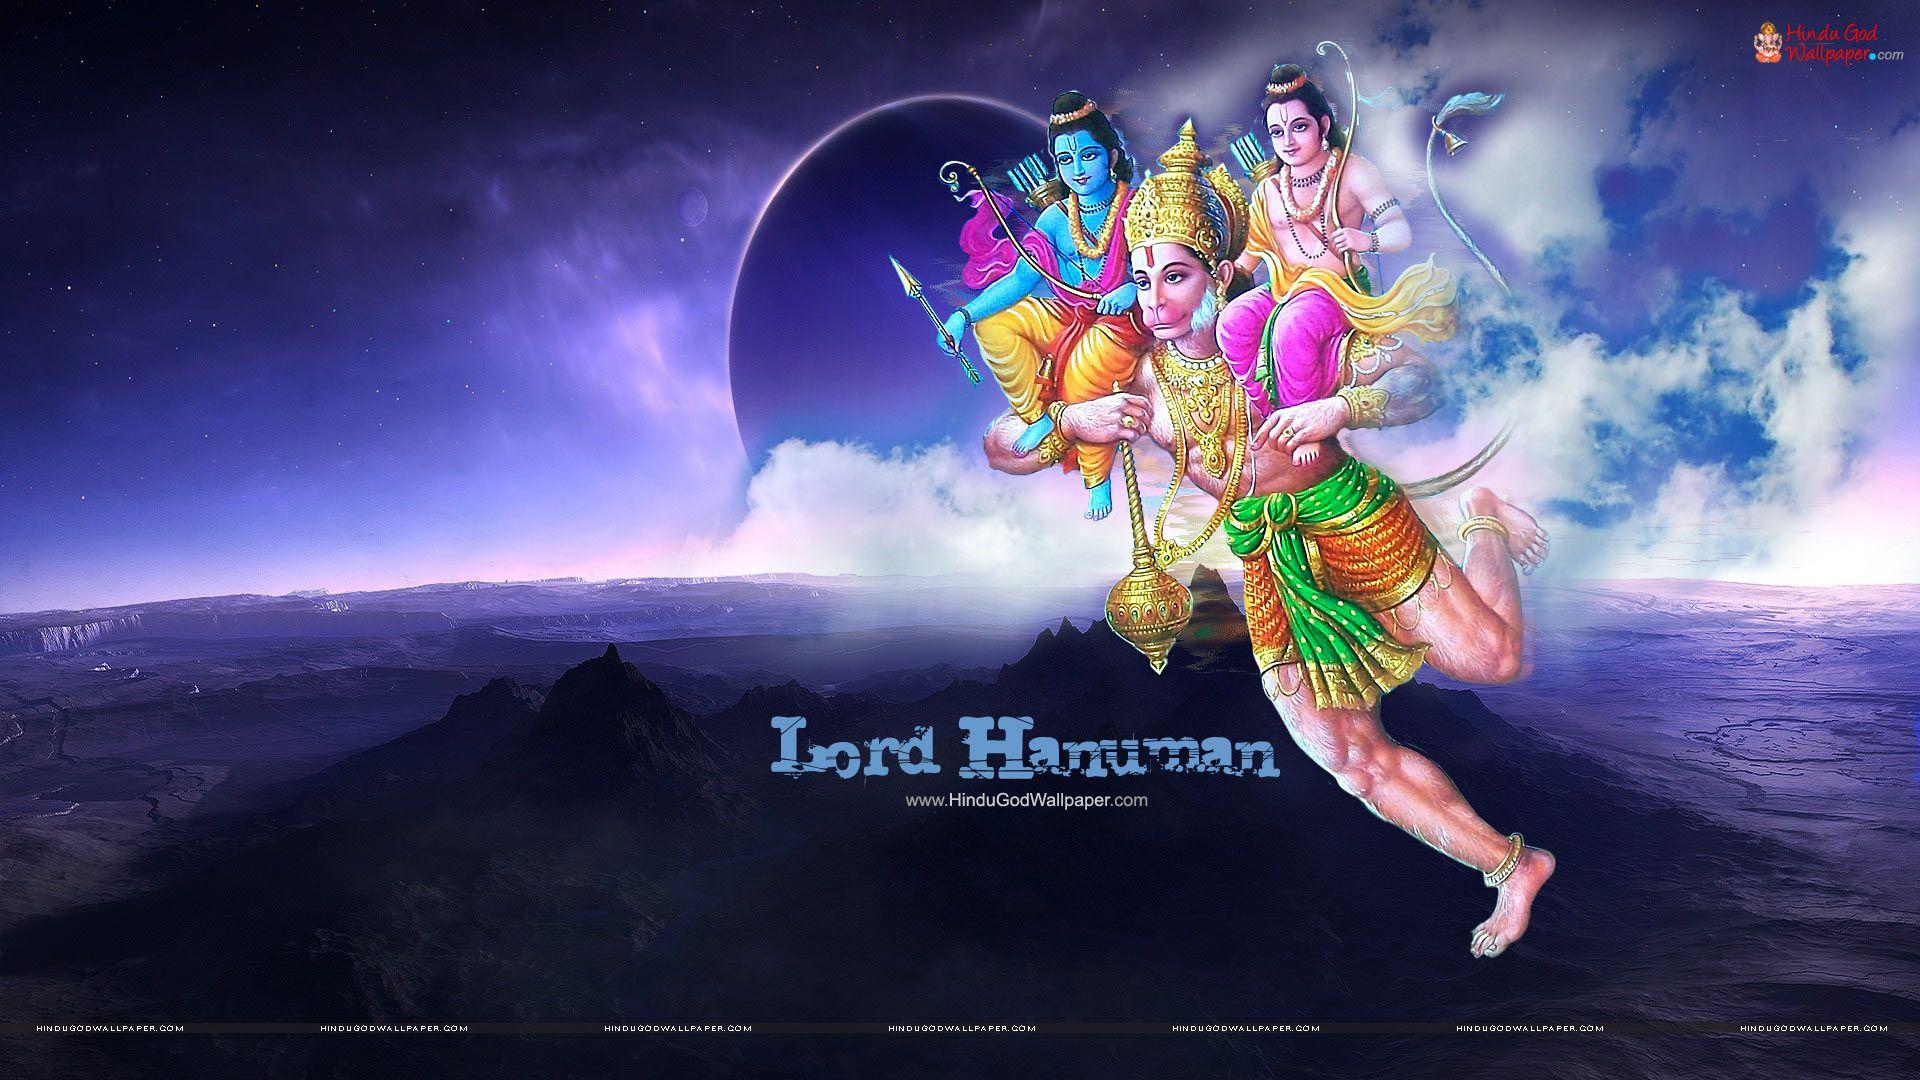 Lord Hanuman Hd Wallpaper Download Hanuman Hd Wallpaper Hanuman Wallpaper Hd Wallpaper